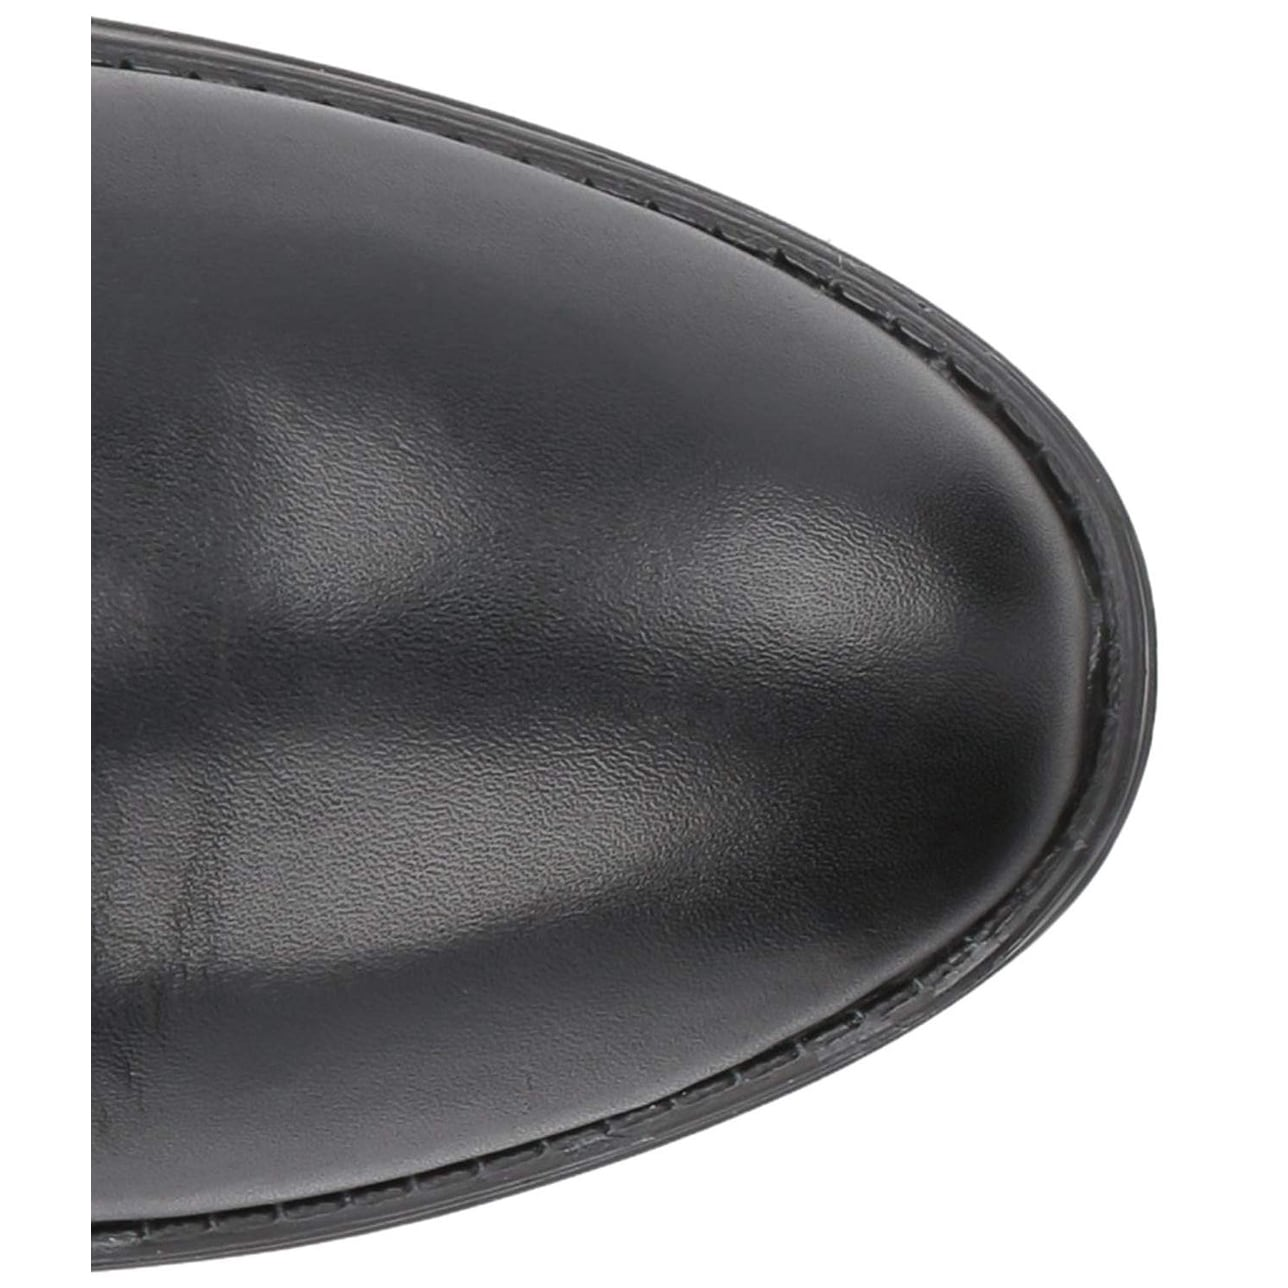 b704fa32127a7 Shop Sam Edelman Women s Portman Knee High Boot - Free Shipping Today -  Overstock - 22811385